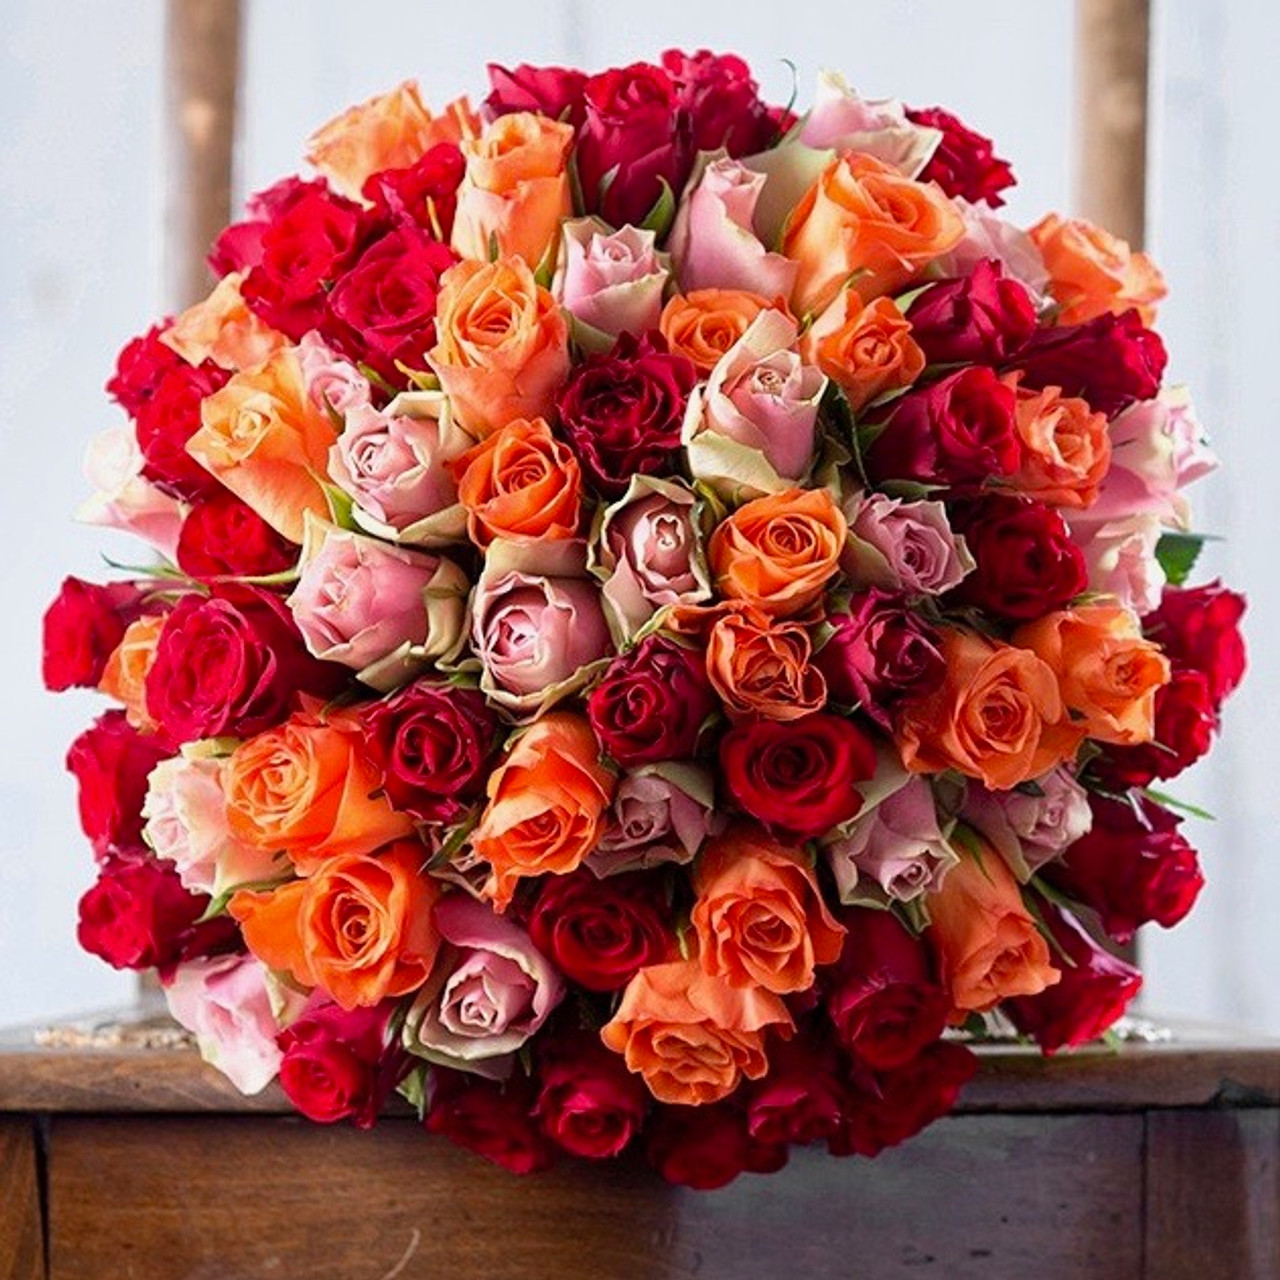 50 assorted Ecuadorian Roses Giant Bouquet